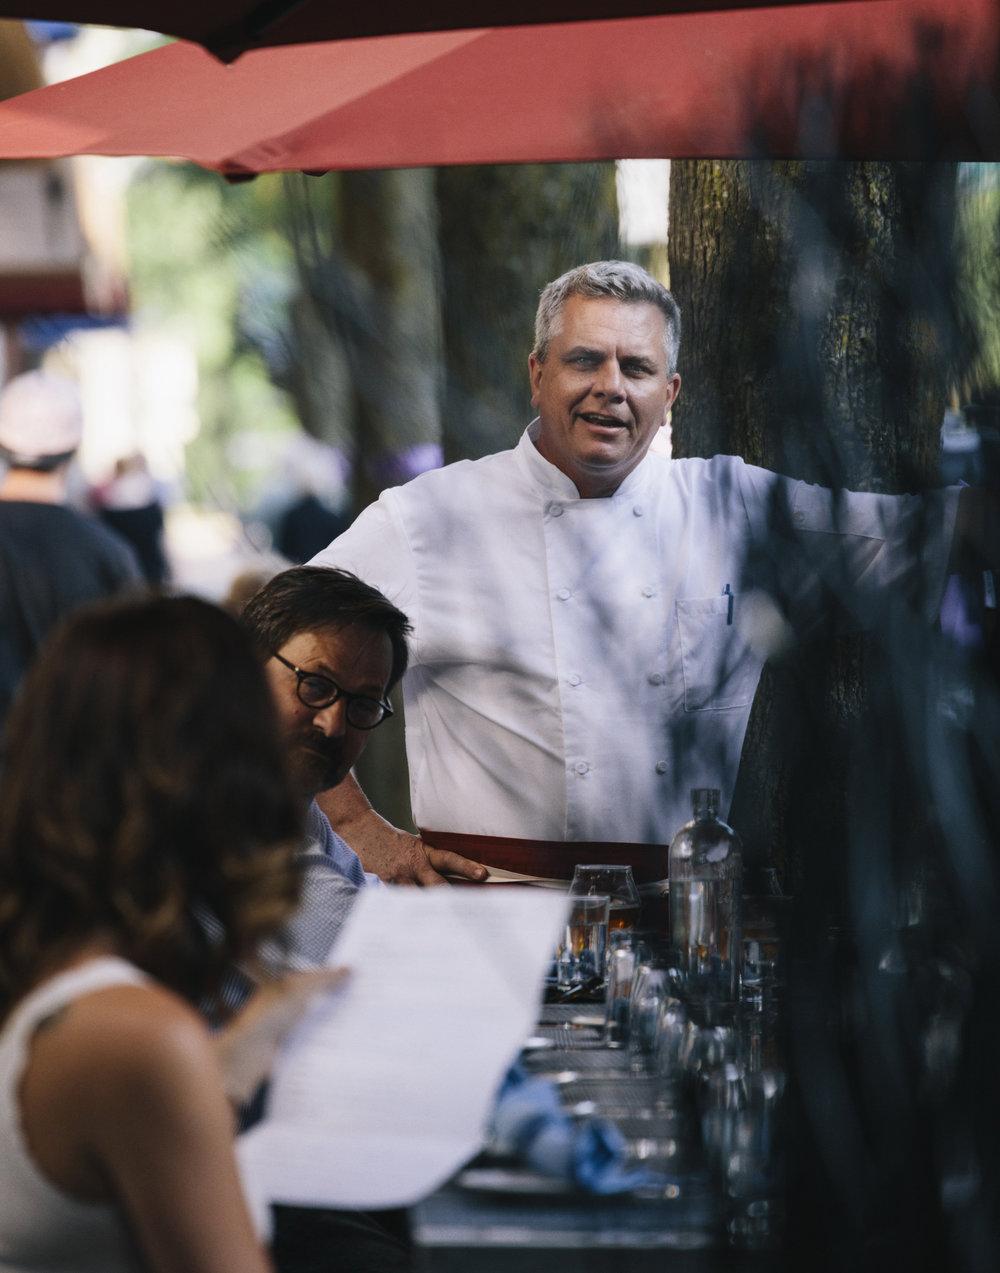 Gethin Thomas, founder and head chef at Henry Social Club.